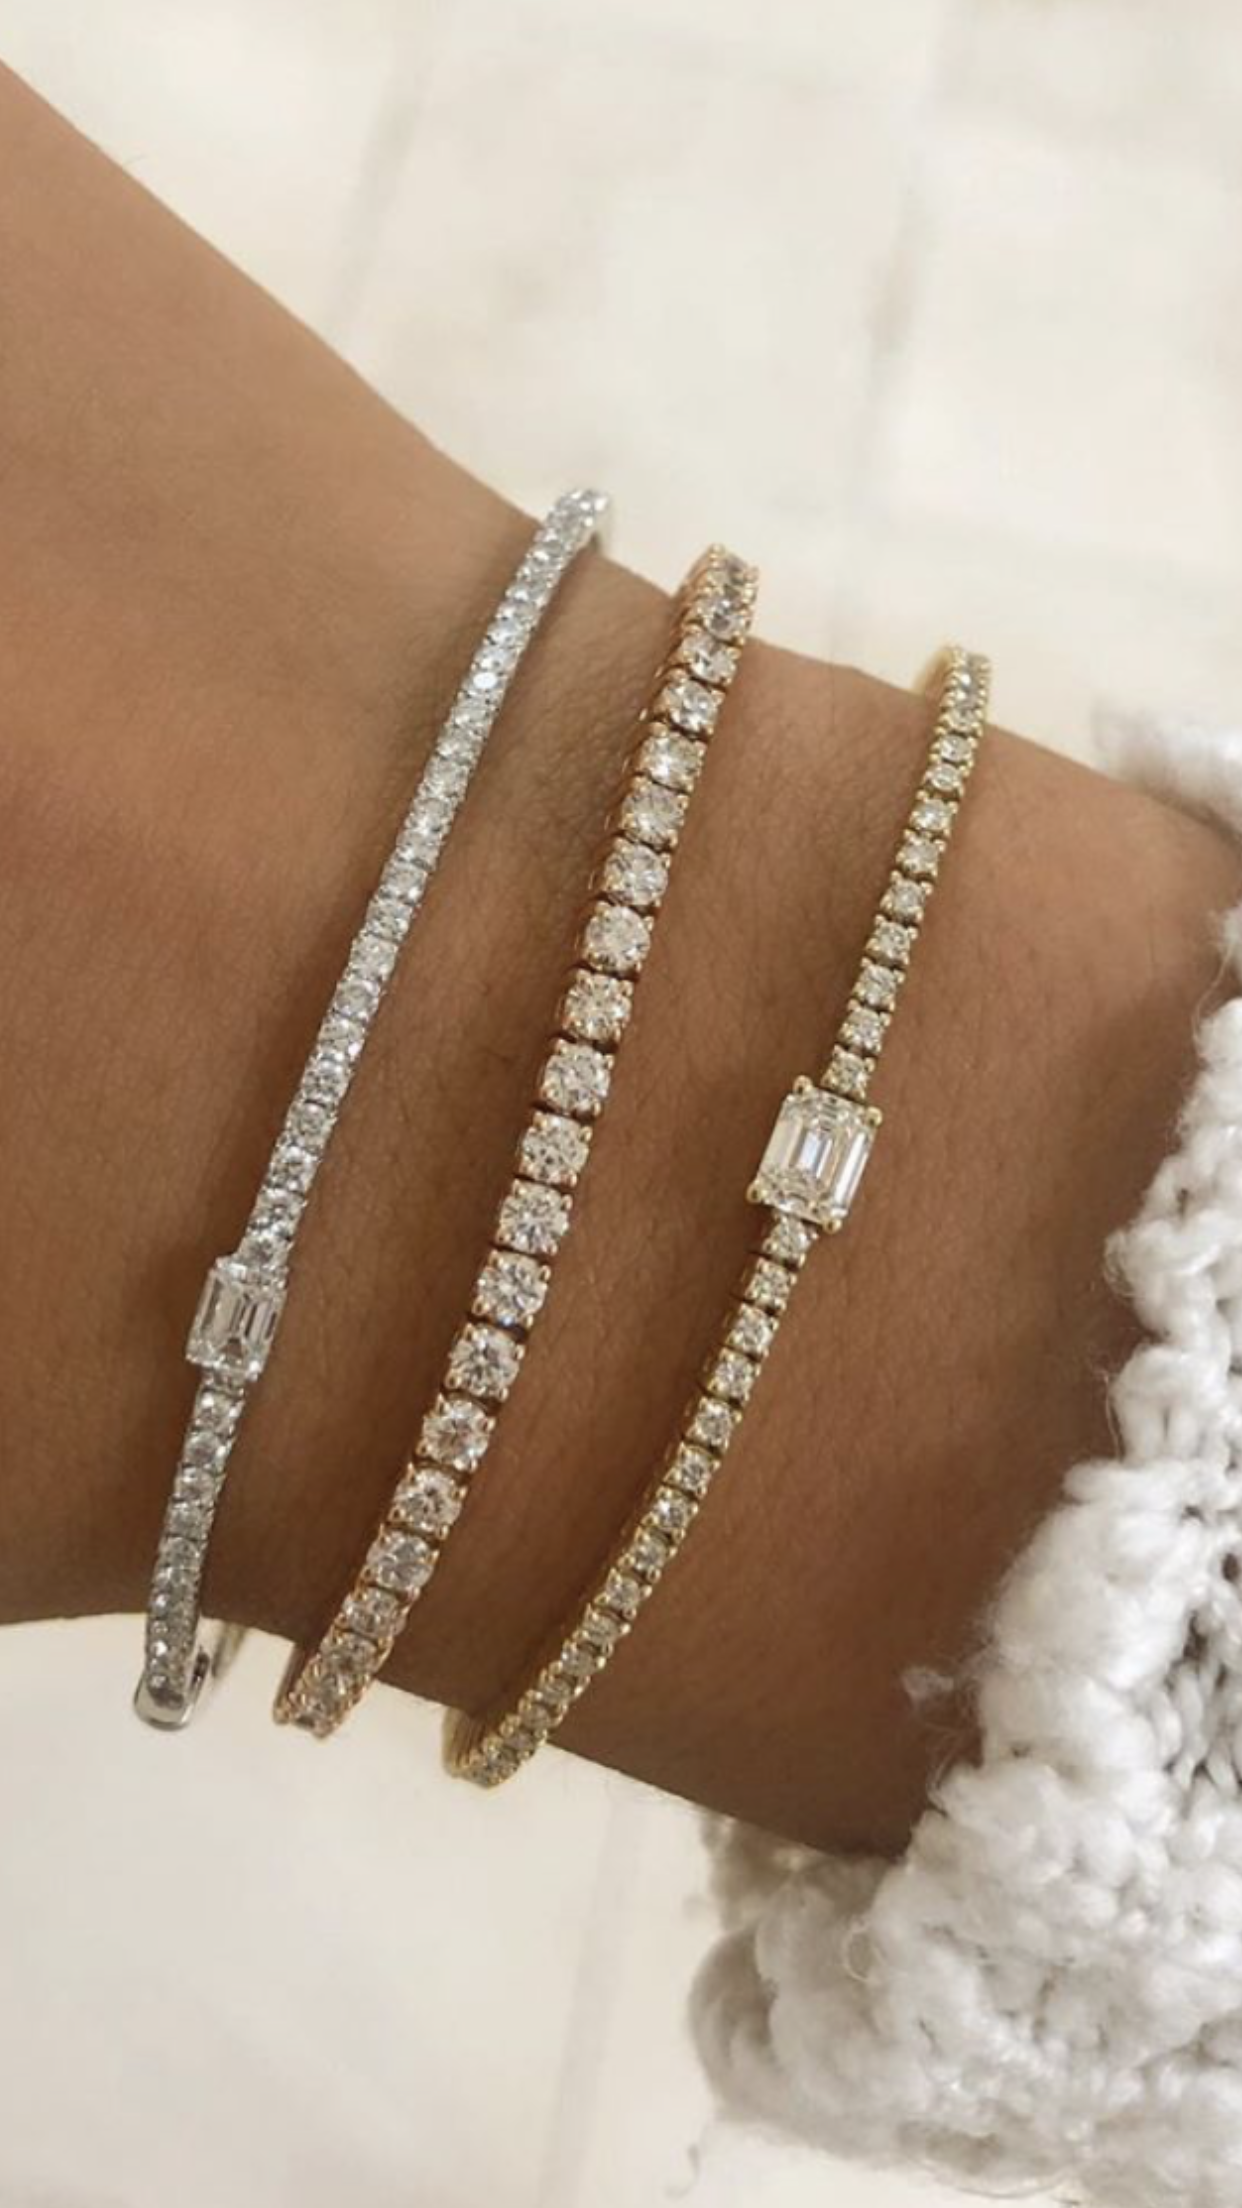 Black Diamond Bracelet Silver Beaded Bracelet GenuineDiamond Bracelet  Black Diamond Minimal Bracelet Beaded Bracelet-Dainty Bracelet